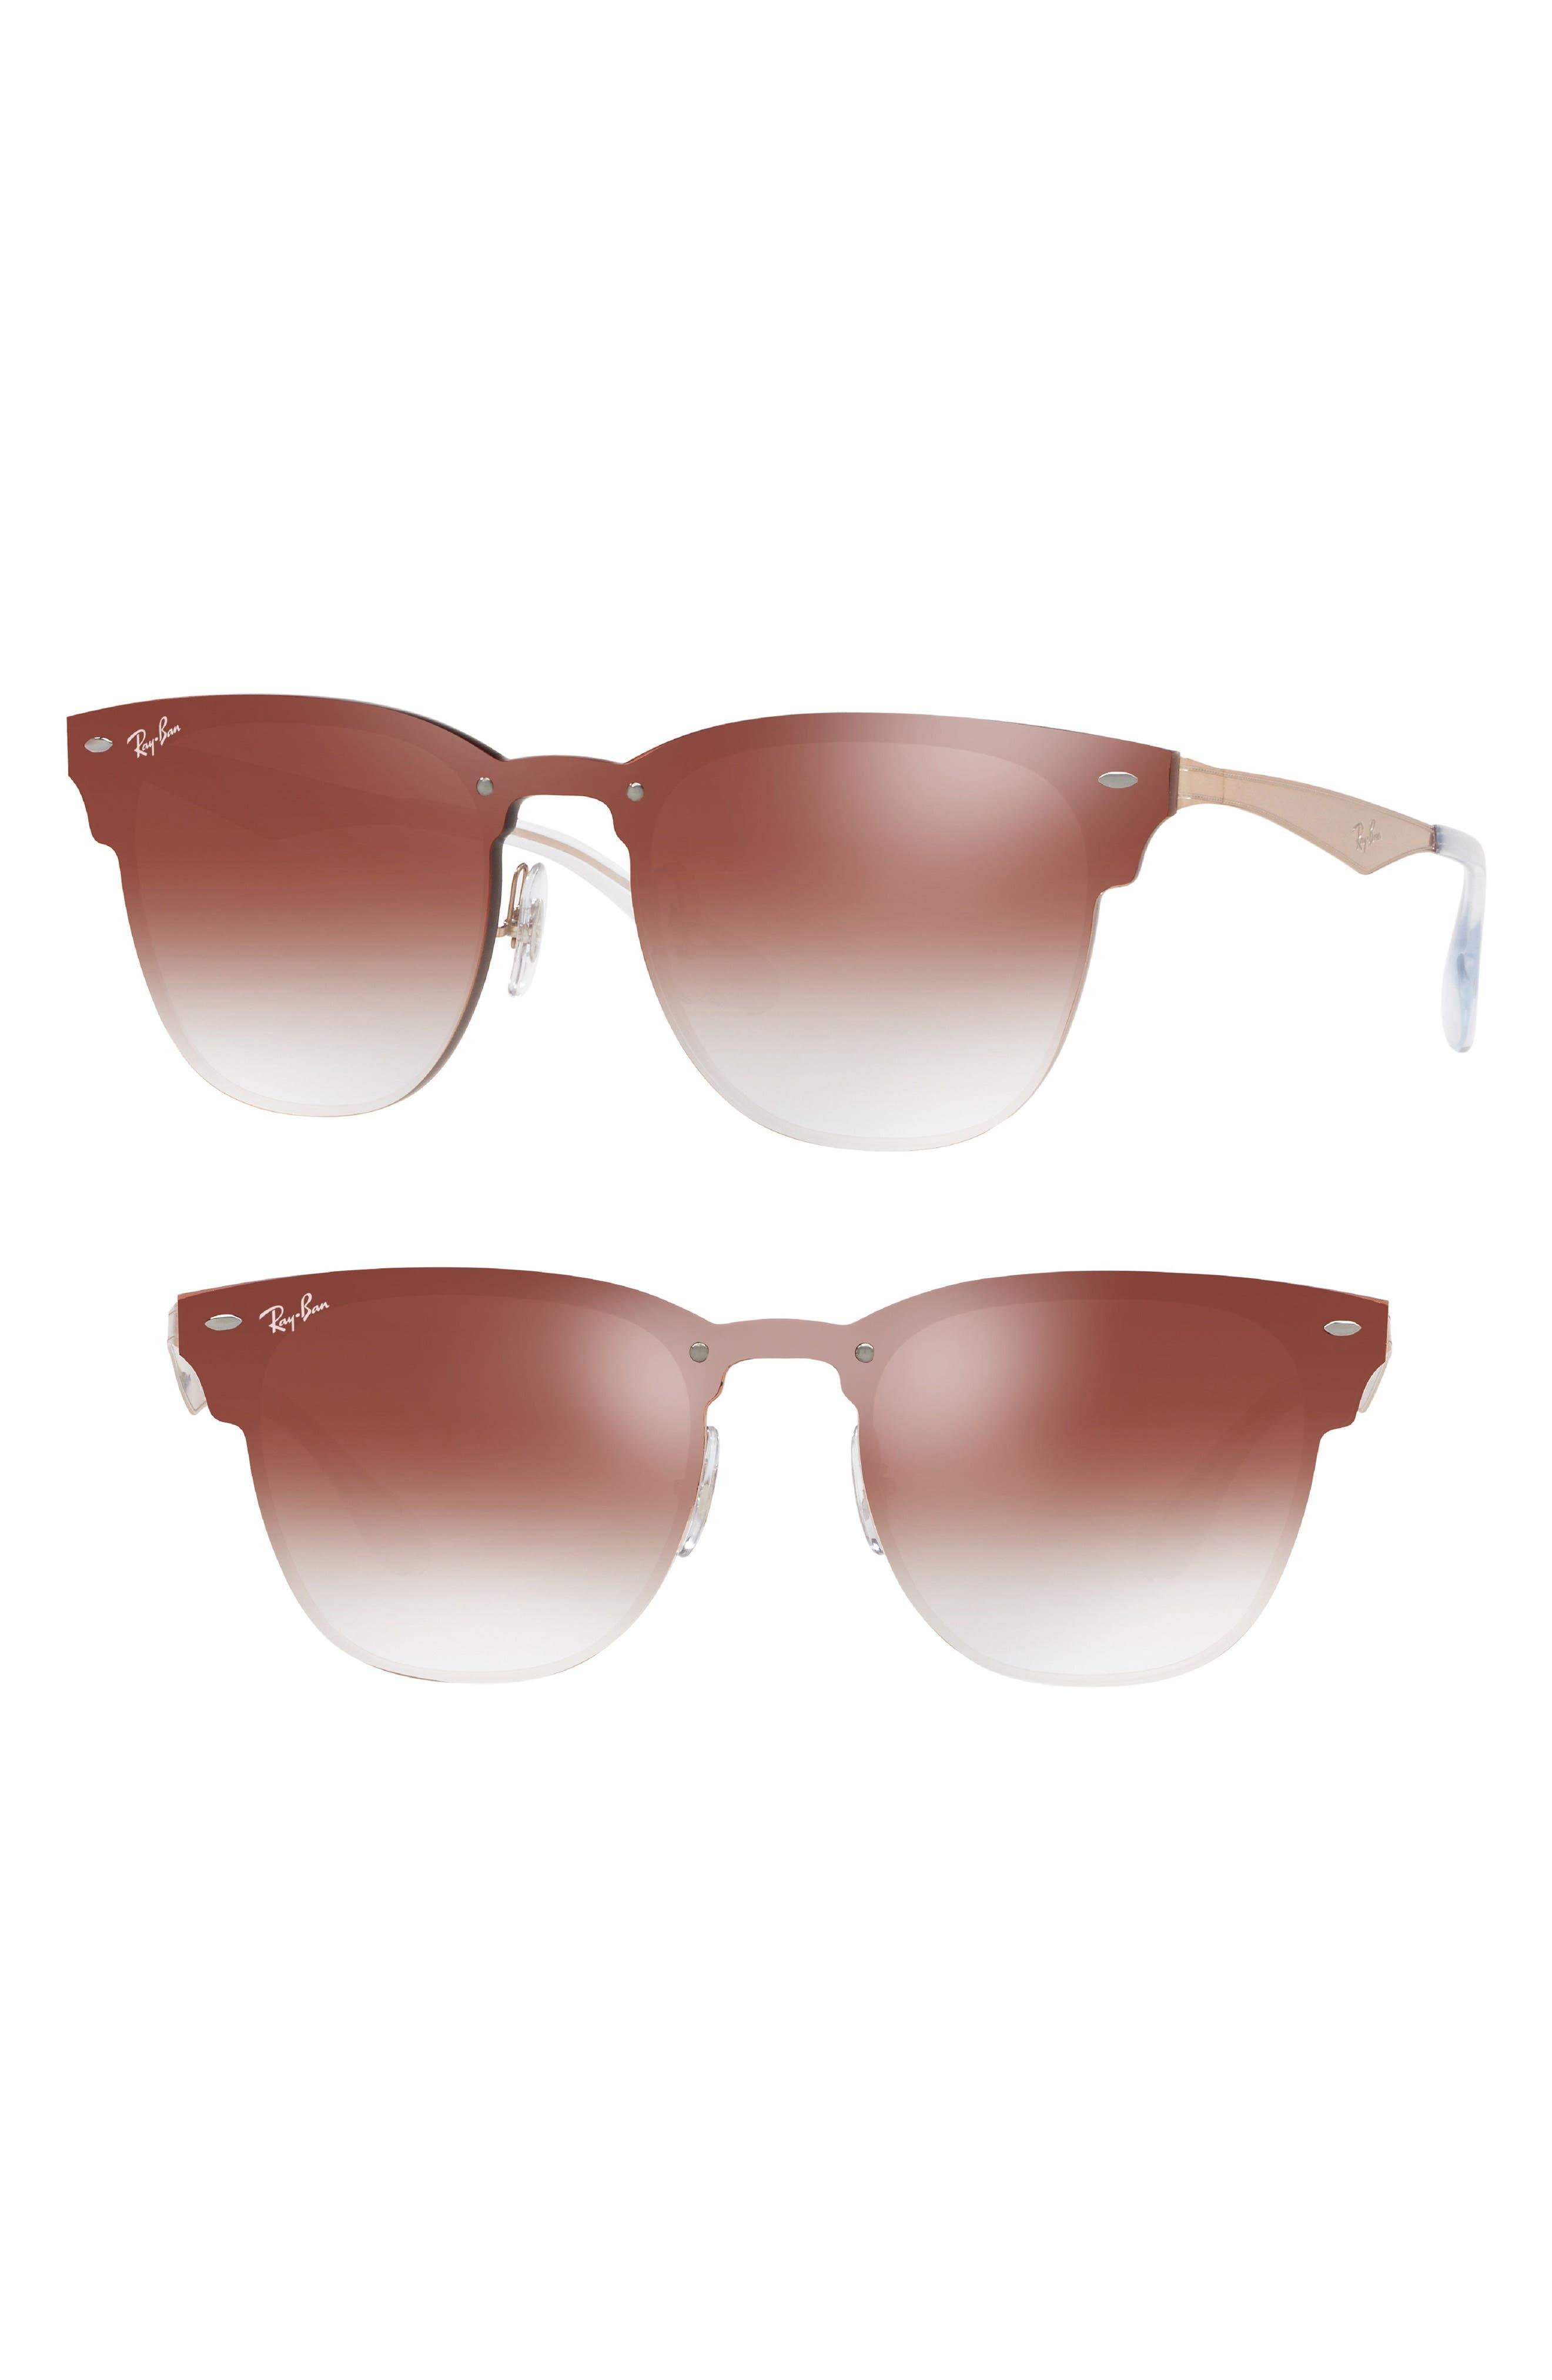 Blaze Clubmaster 47mm Sunglasses,                         Main,                         color, 221